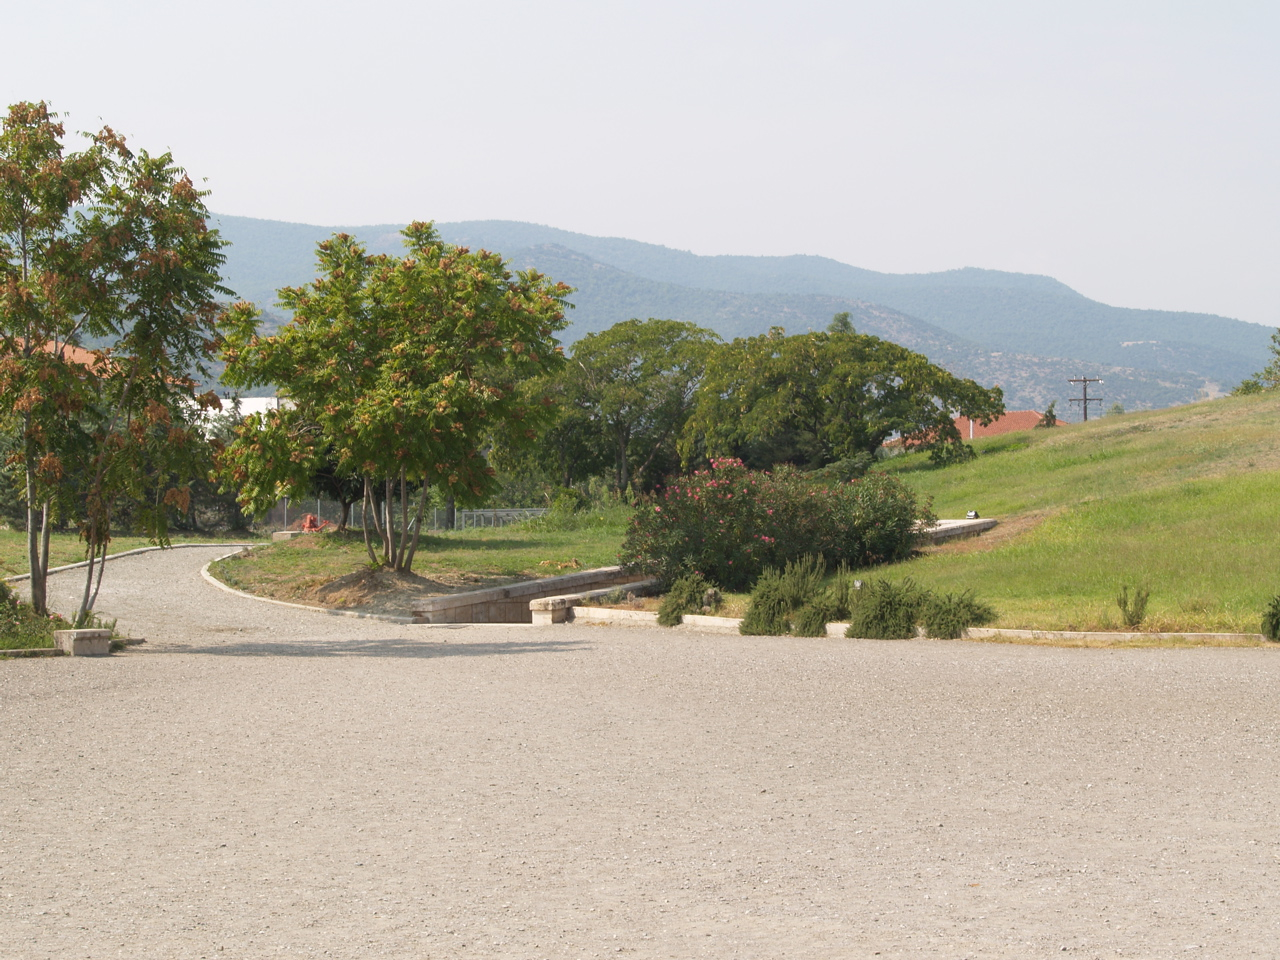 The Entrance to the Royal Tombs at Vergina